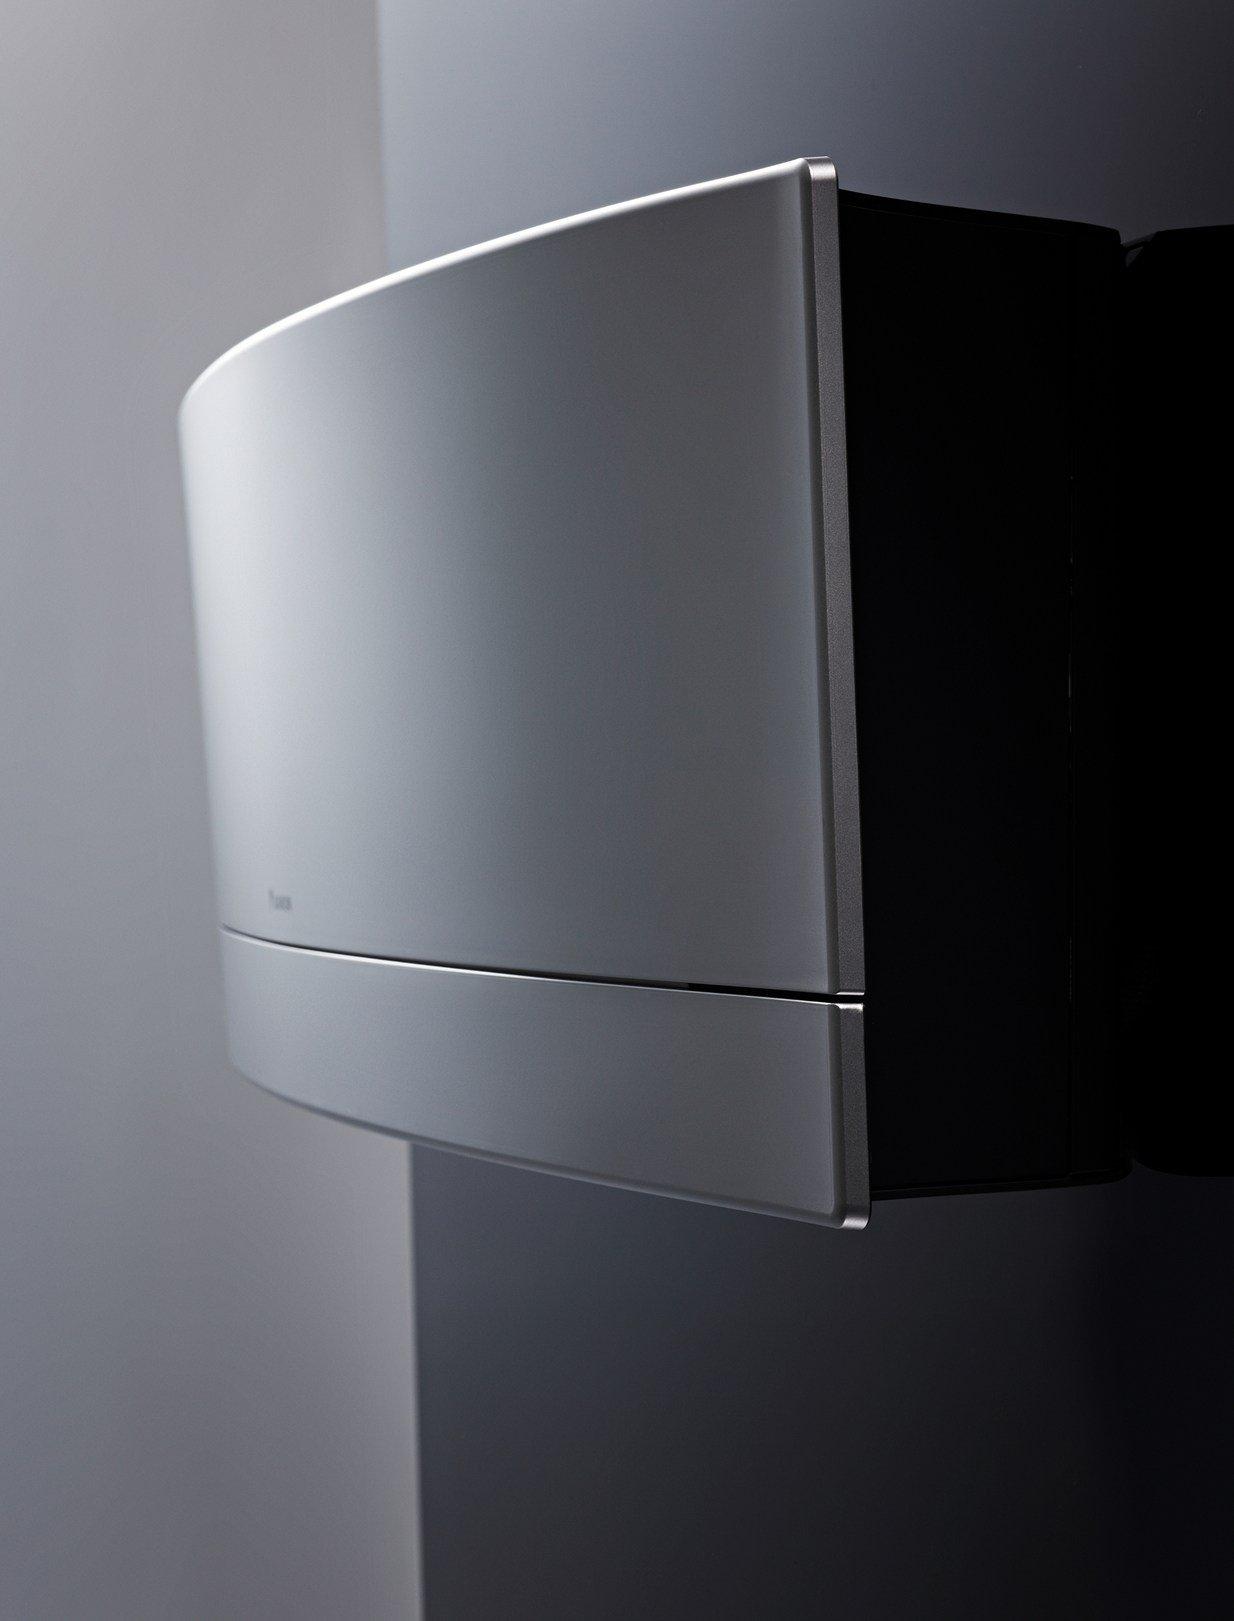 daikin emura si aggiudica l if design award 2015. Black Bedroom Furniture Sets. Home Design Ideas